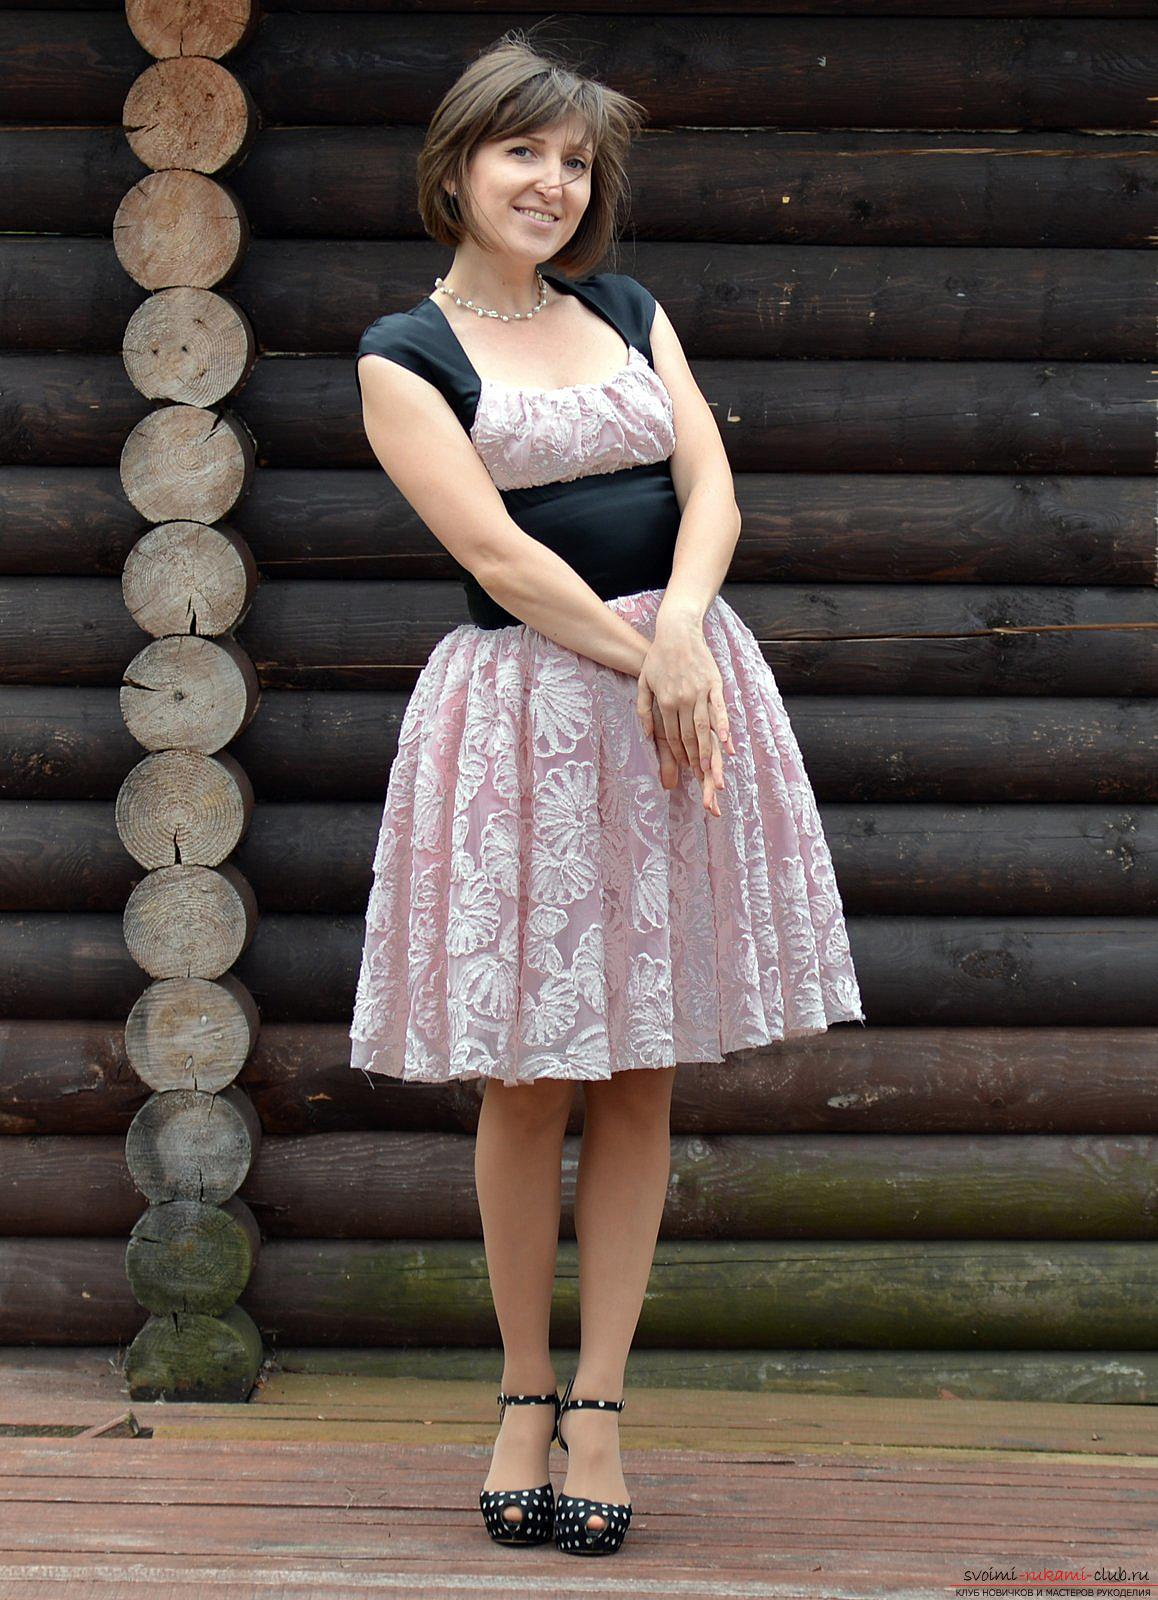 Шитье платья мастер класс фото #5